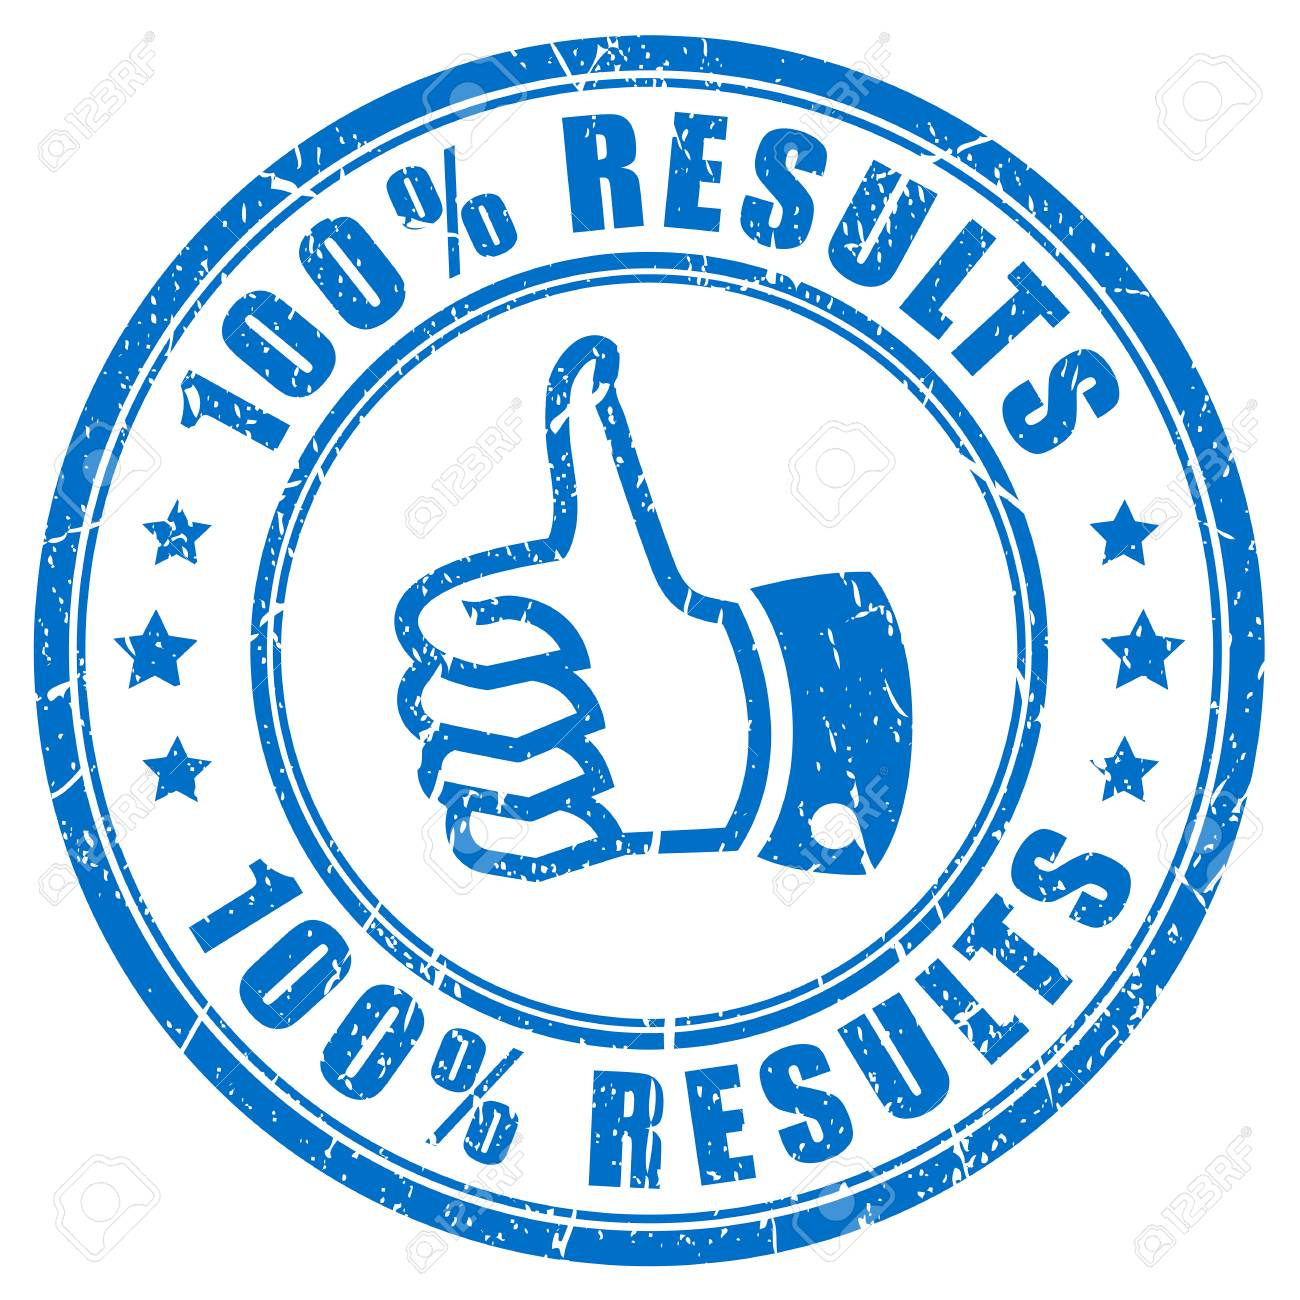 Image result for 100 results logo